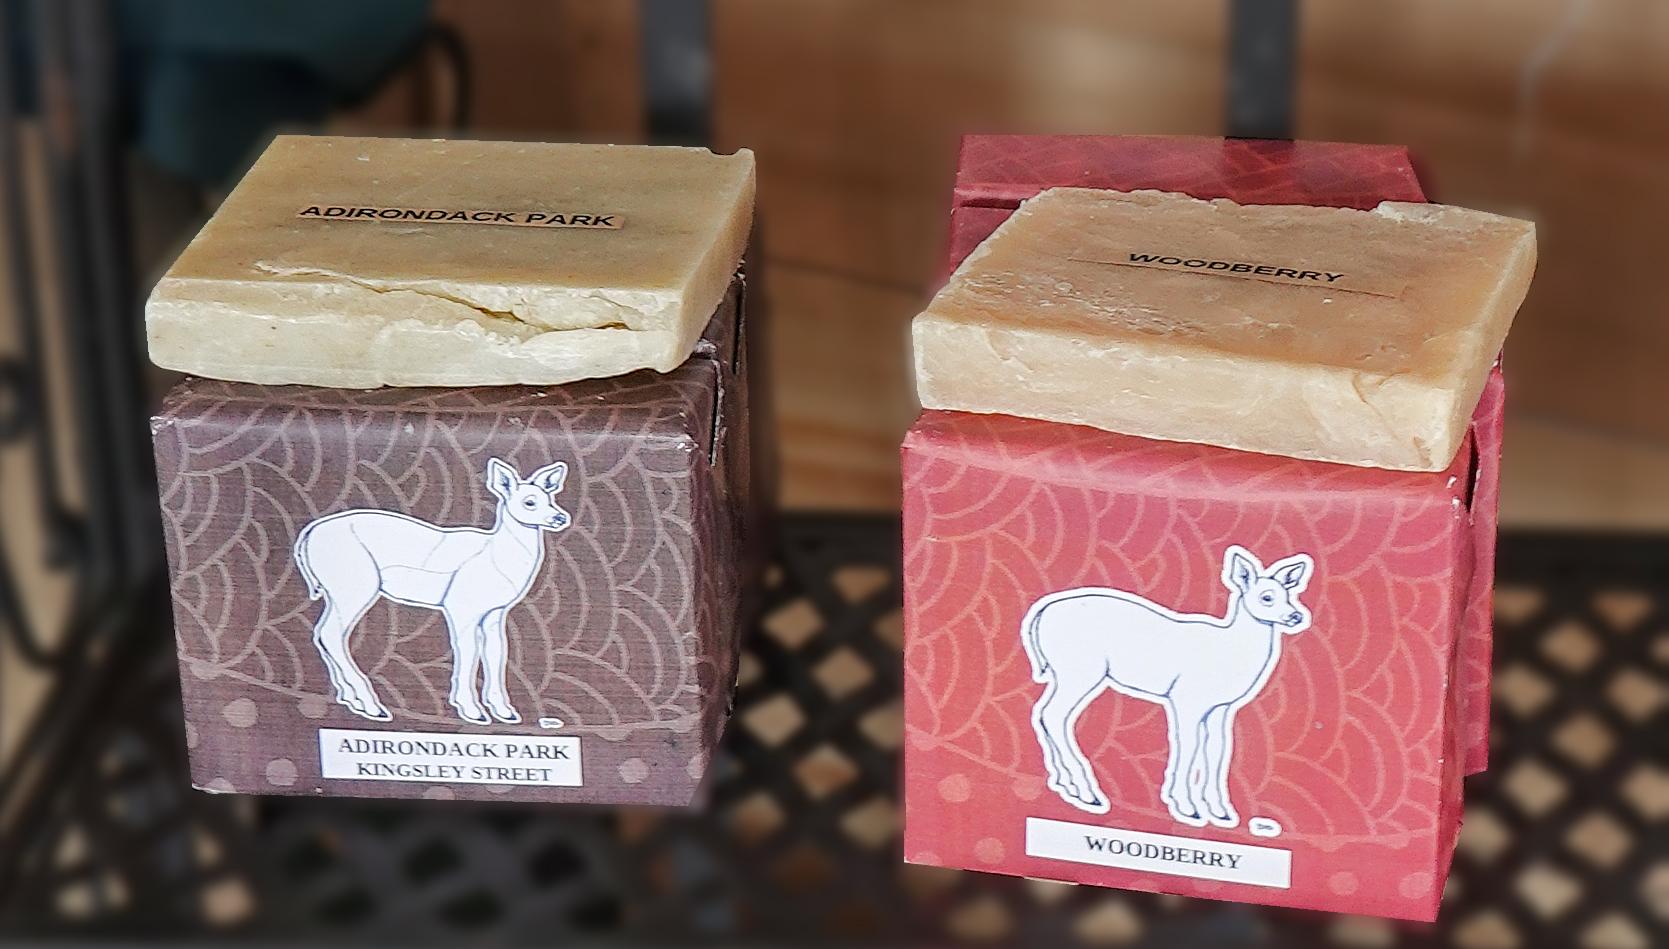 Kingsley Street Artisan Soap/Seneca White Deer Label Collaboration